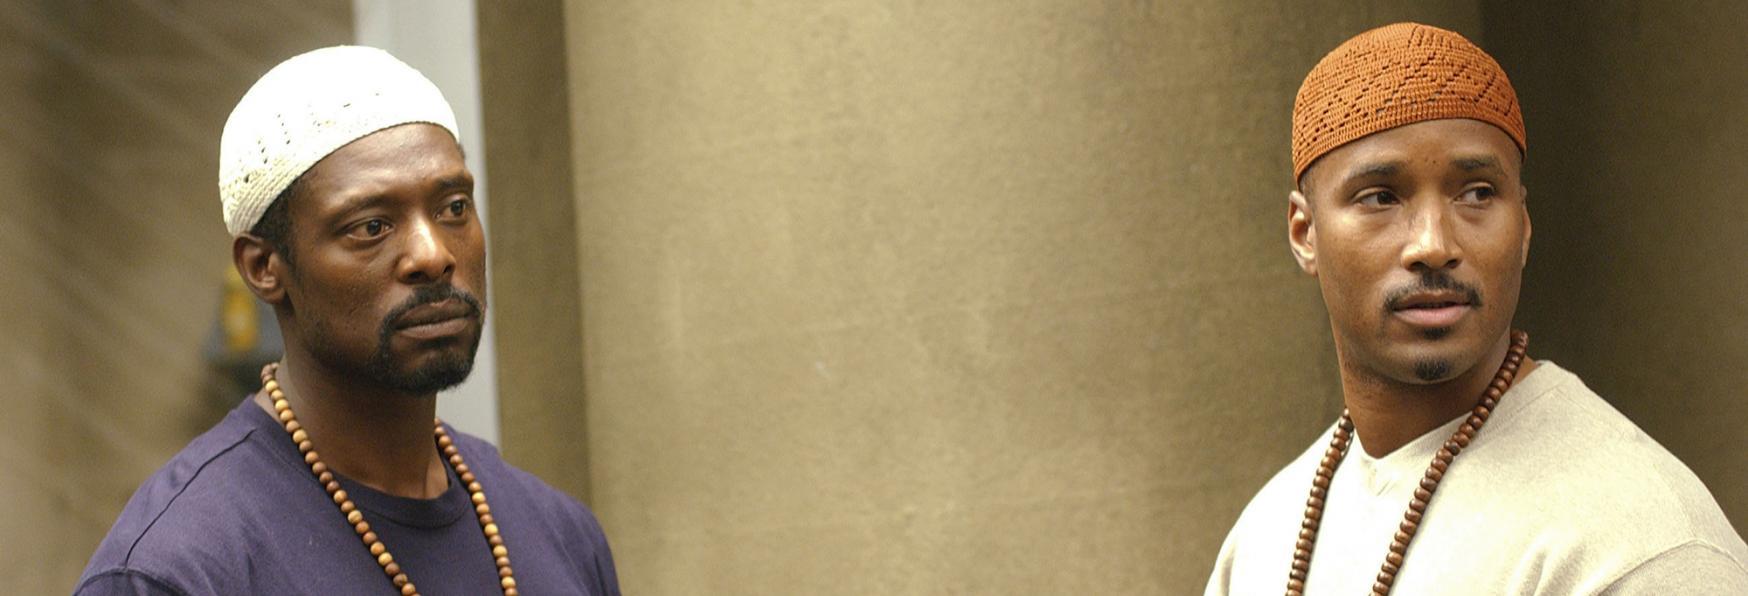 Granville Adams (Zahir Arif nella Serie TV di HBO Oz) Muore a soli 58 Anni